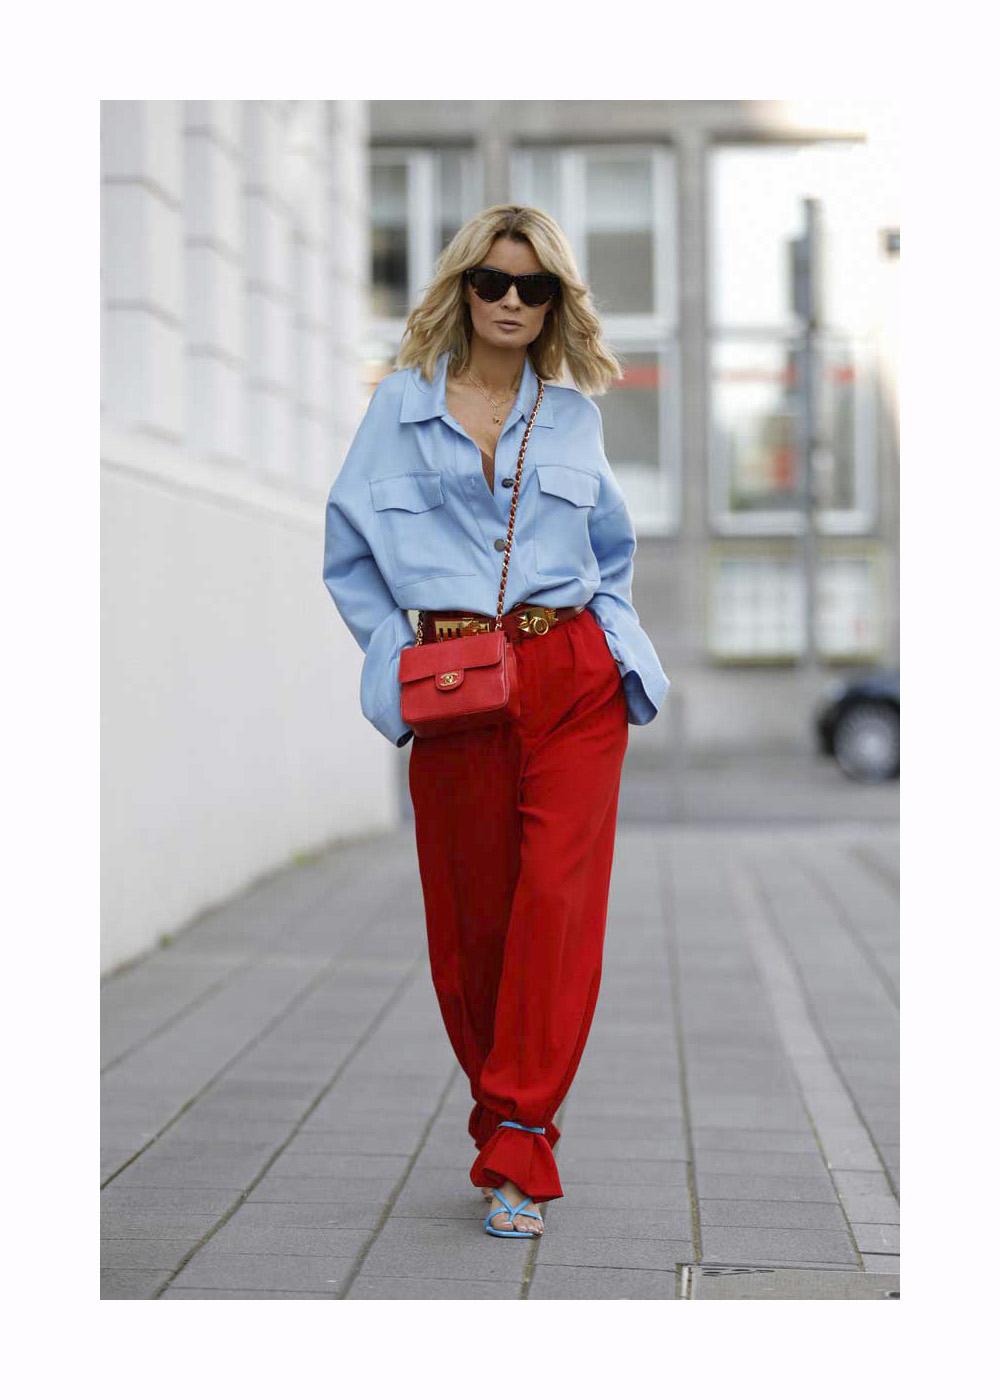 Gitta Banko Street Style – Duesseldorf – June, 2020